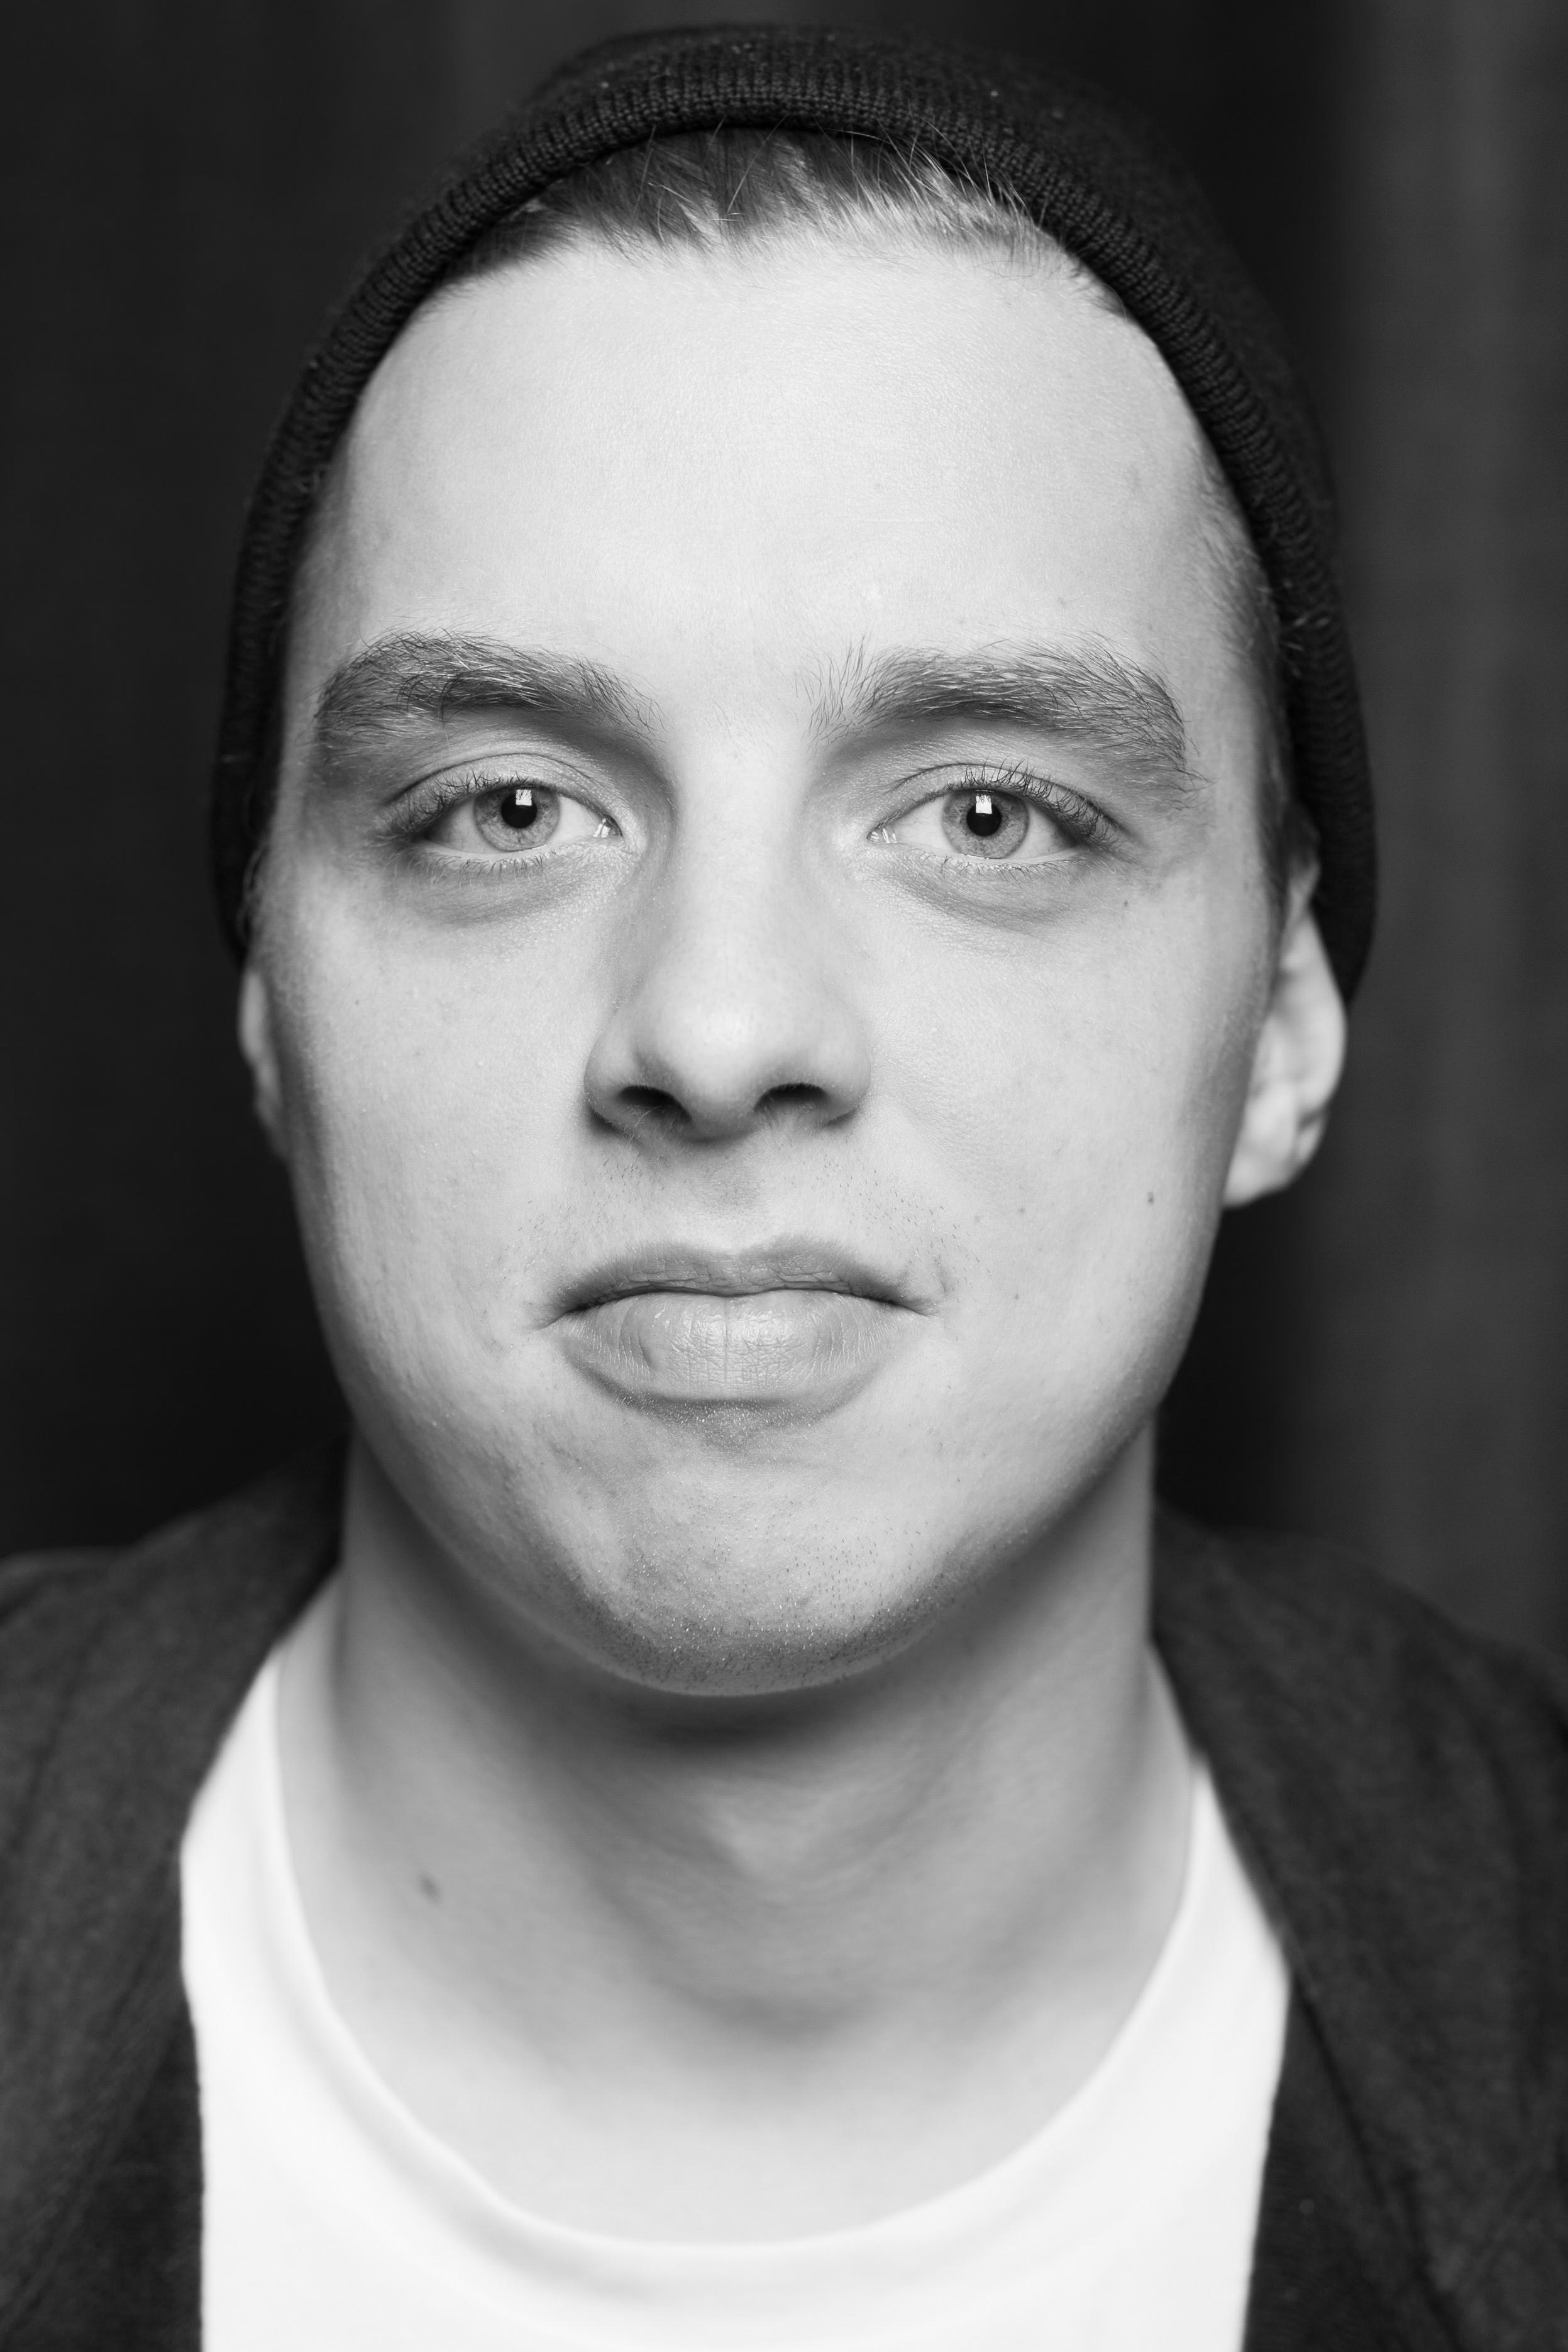 Andreas Jakobsen